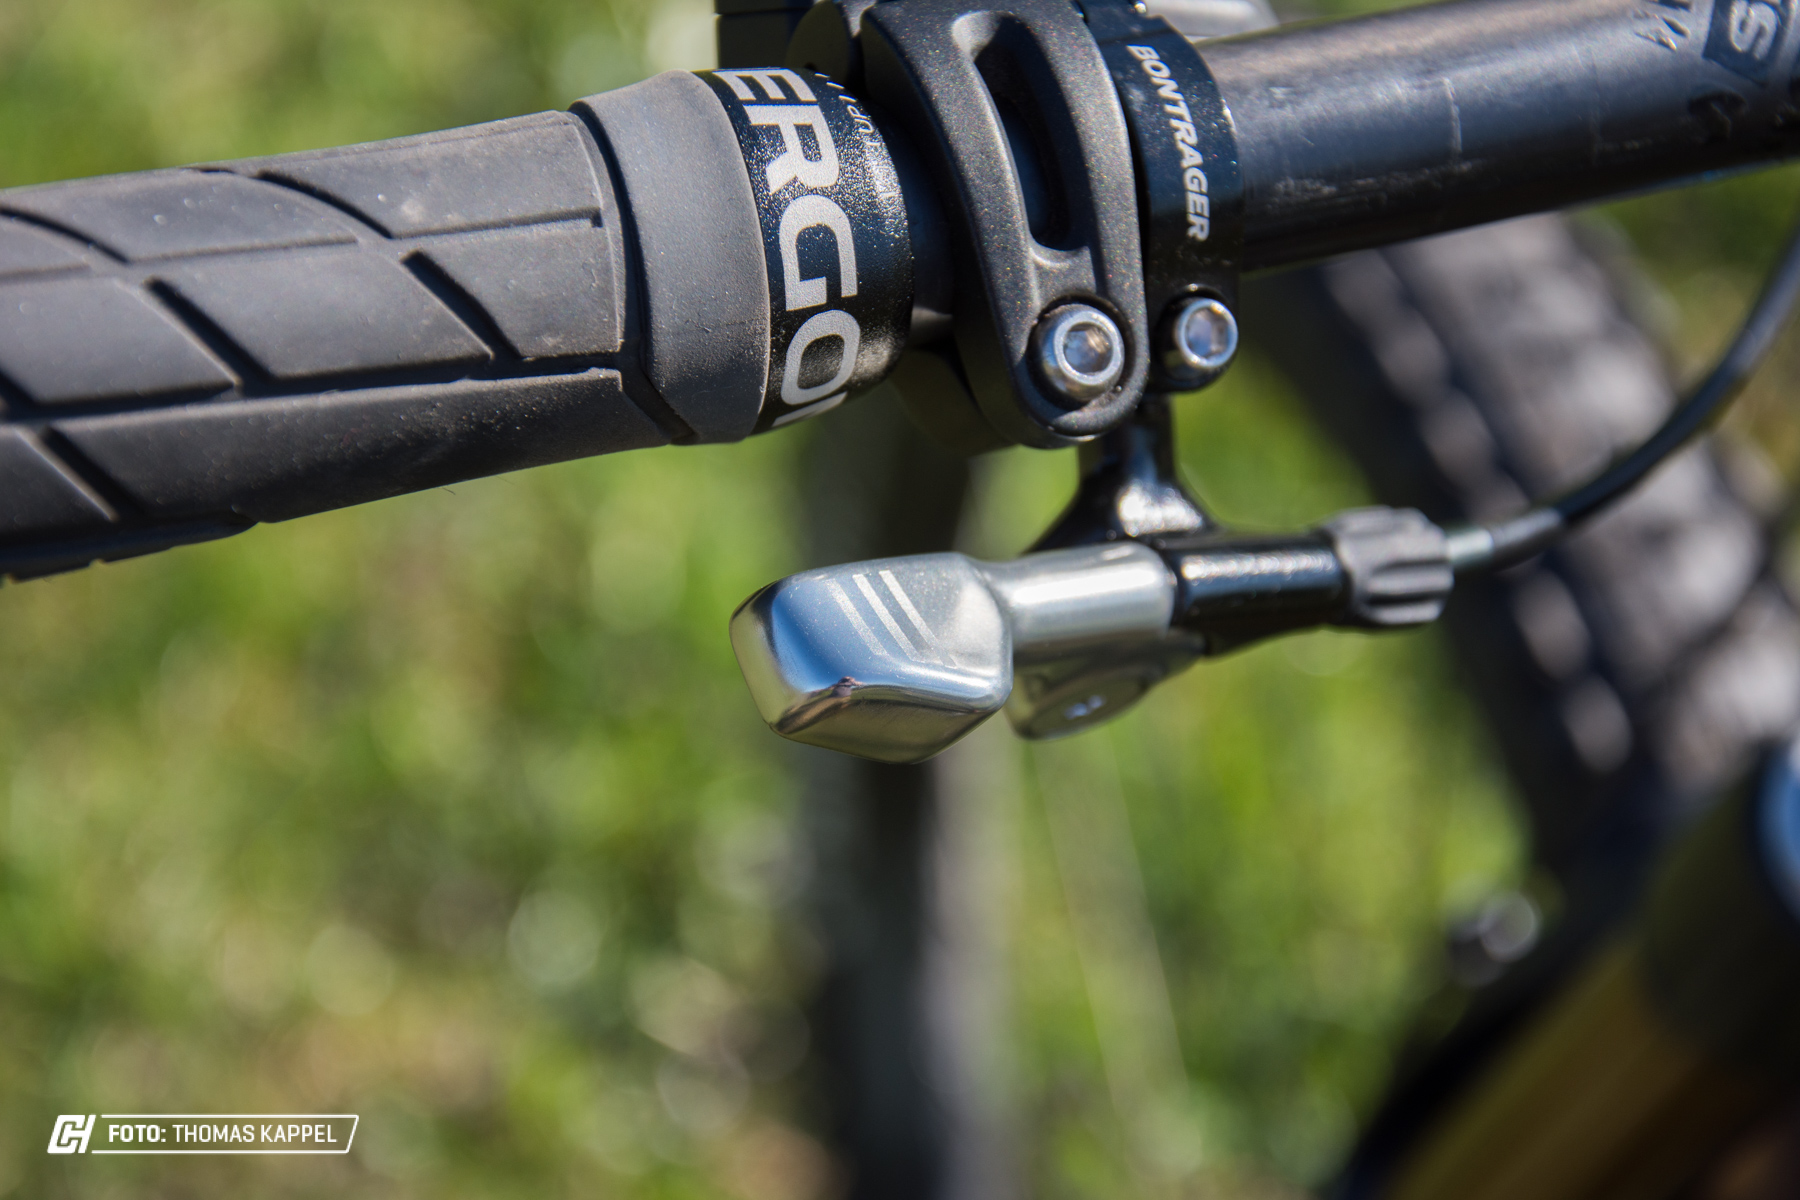 Bontrager4 Cycleholix